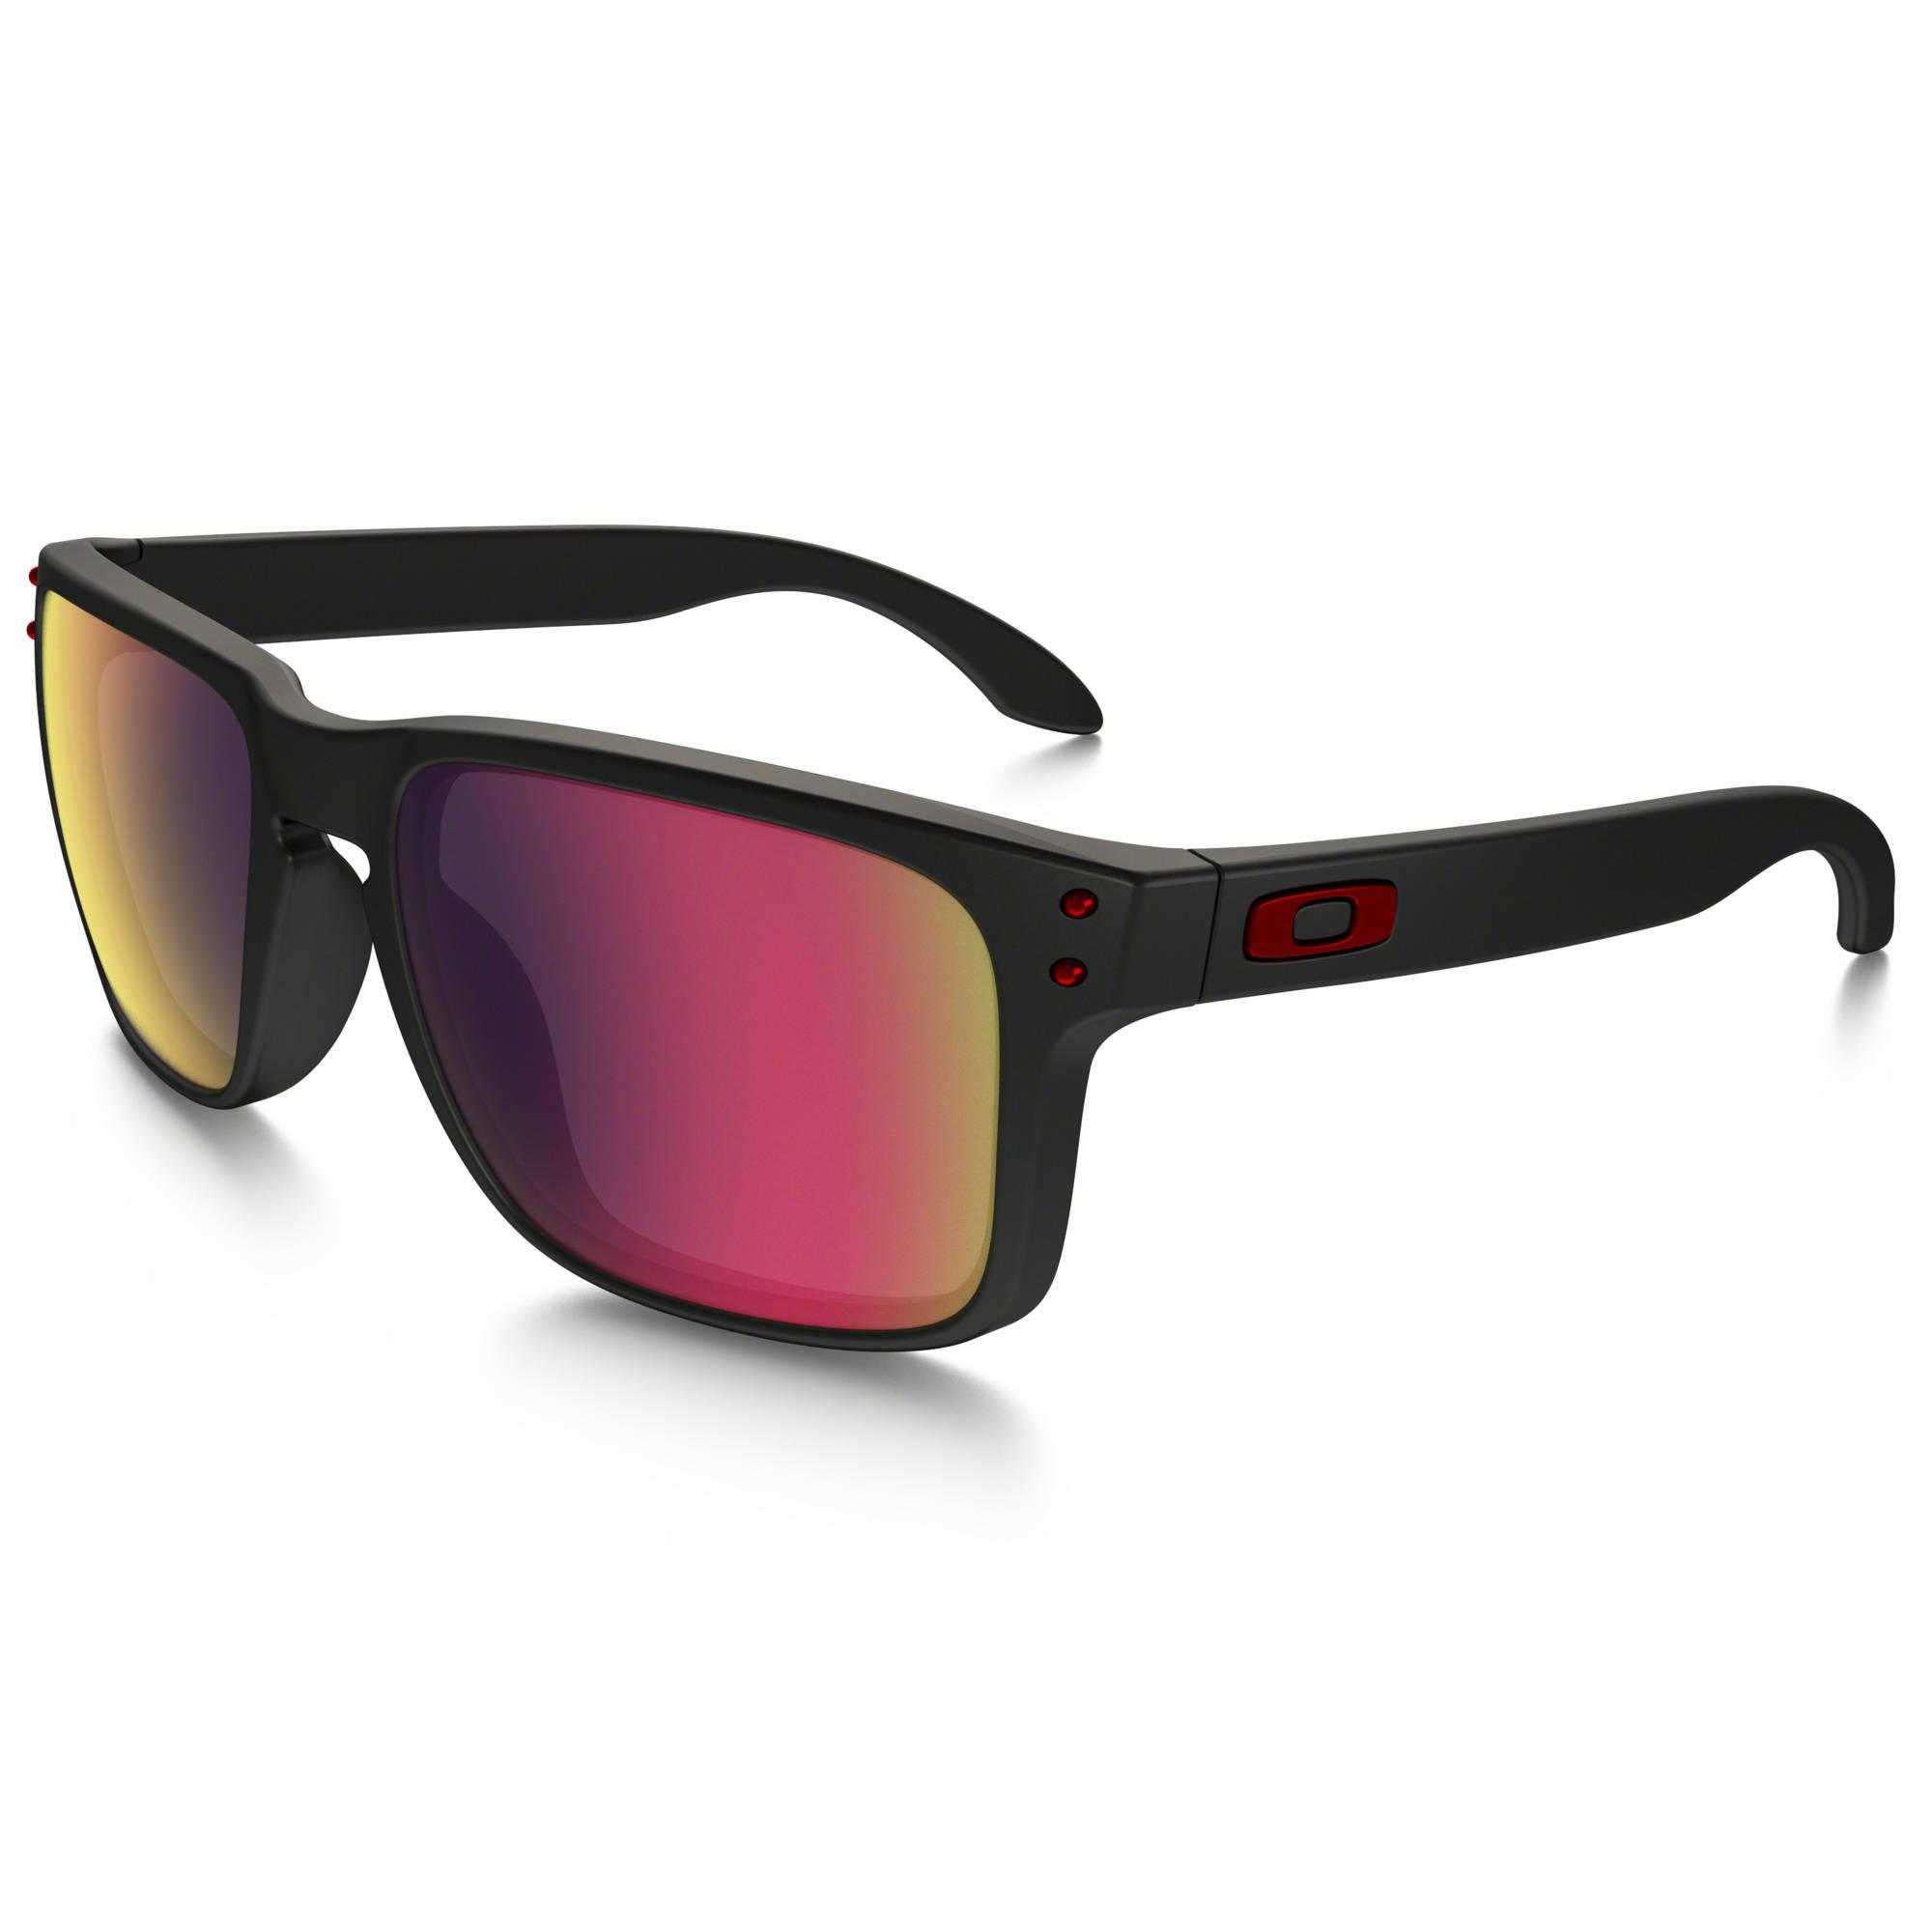 4975c879199 Oakley Holbrook Sunglasses 0OO9102-91023655 B H Photo Video